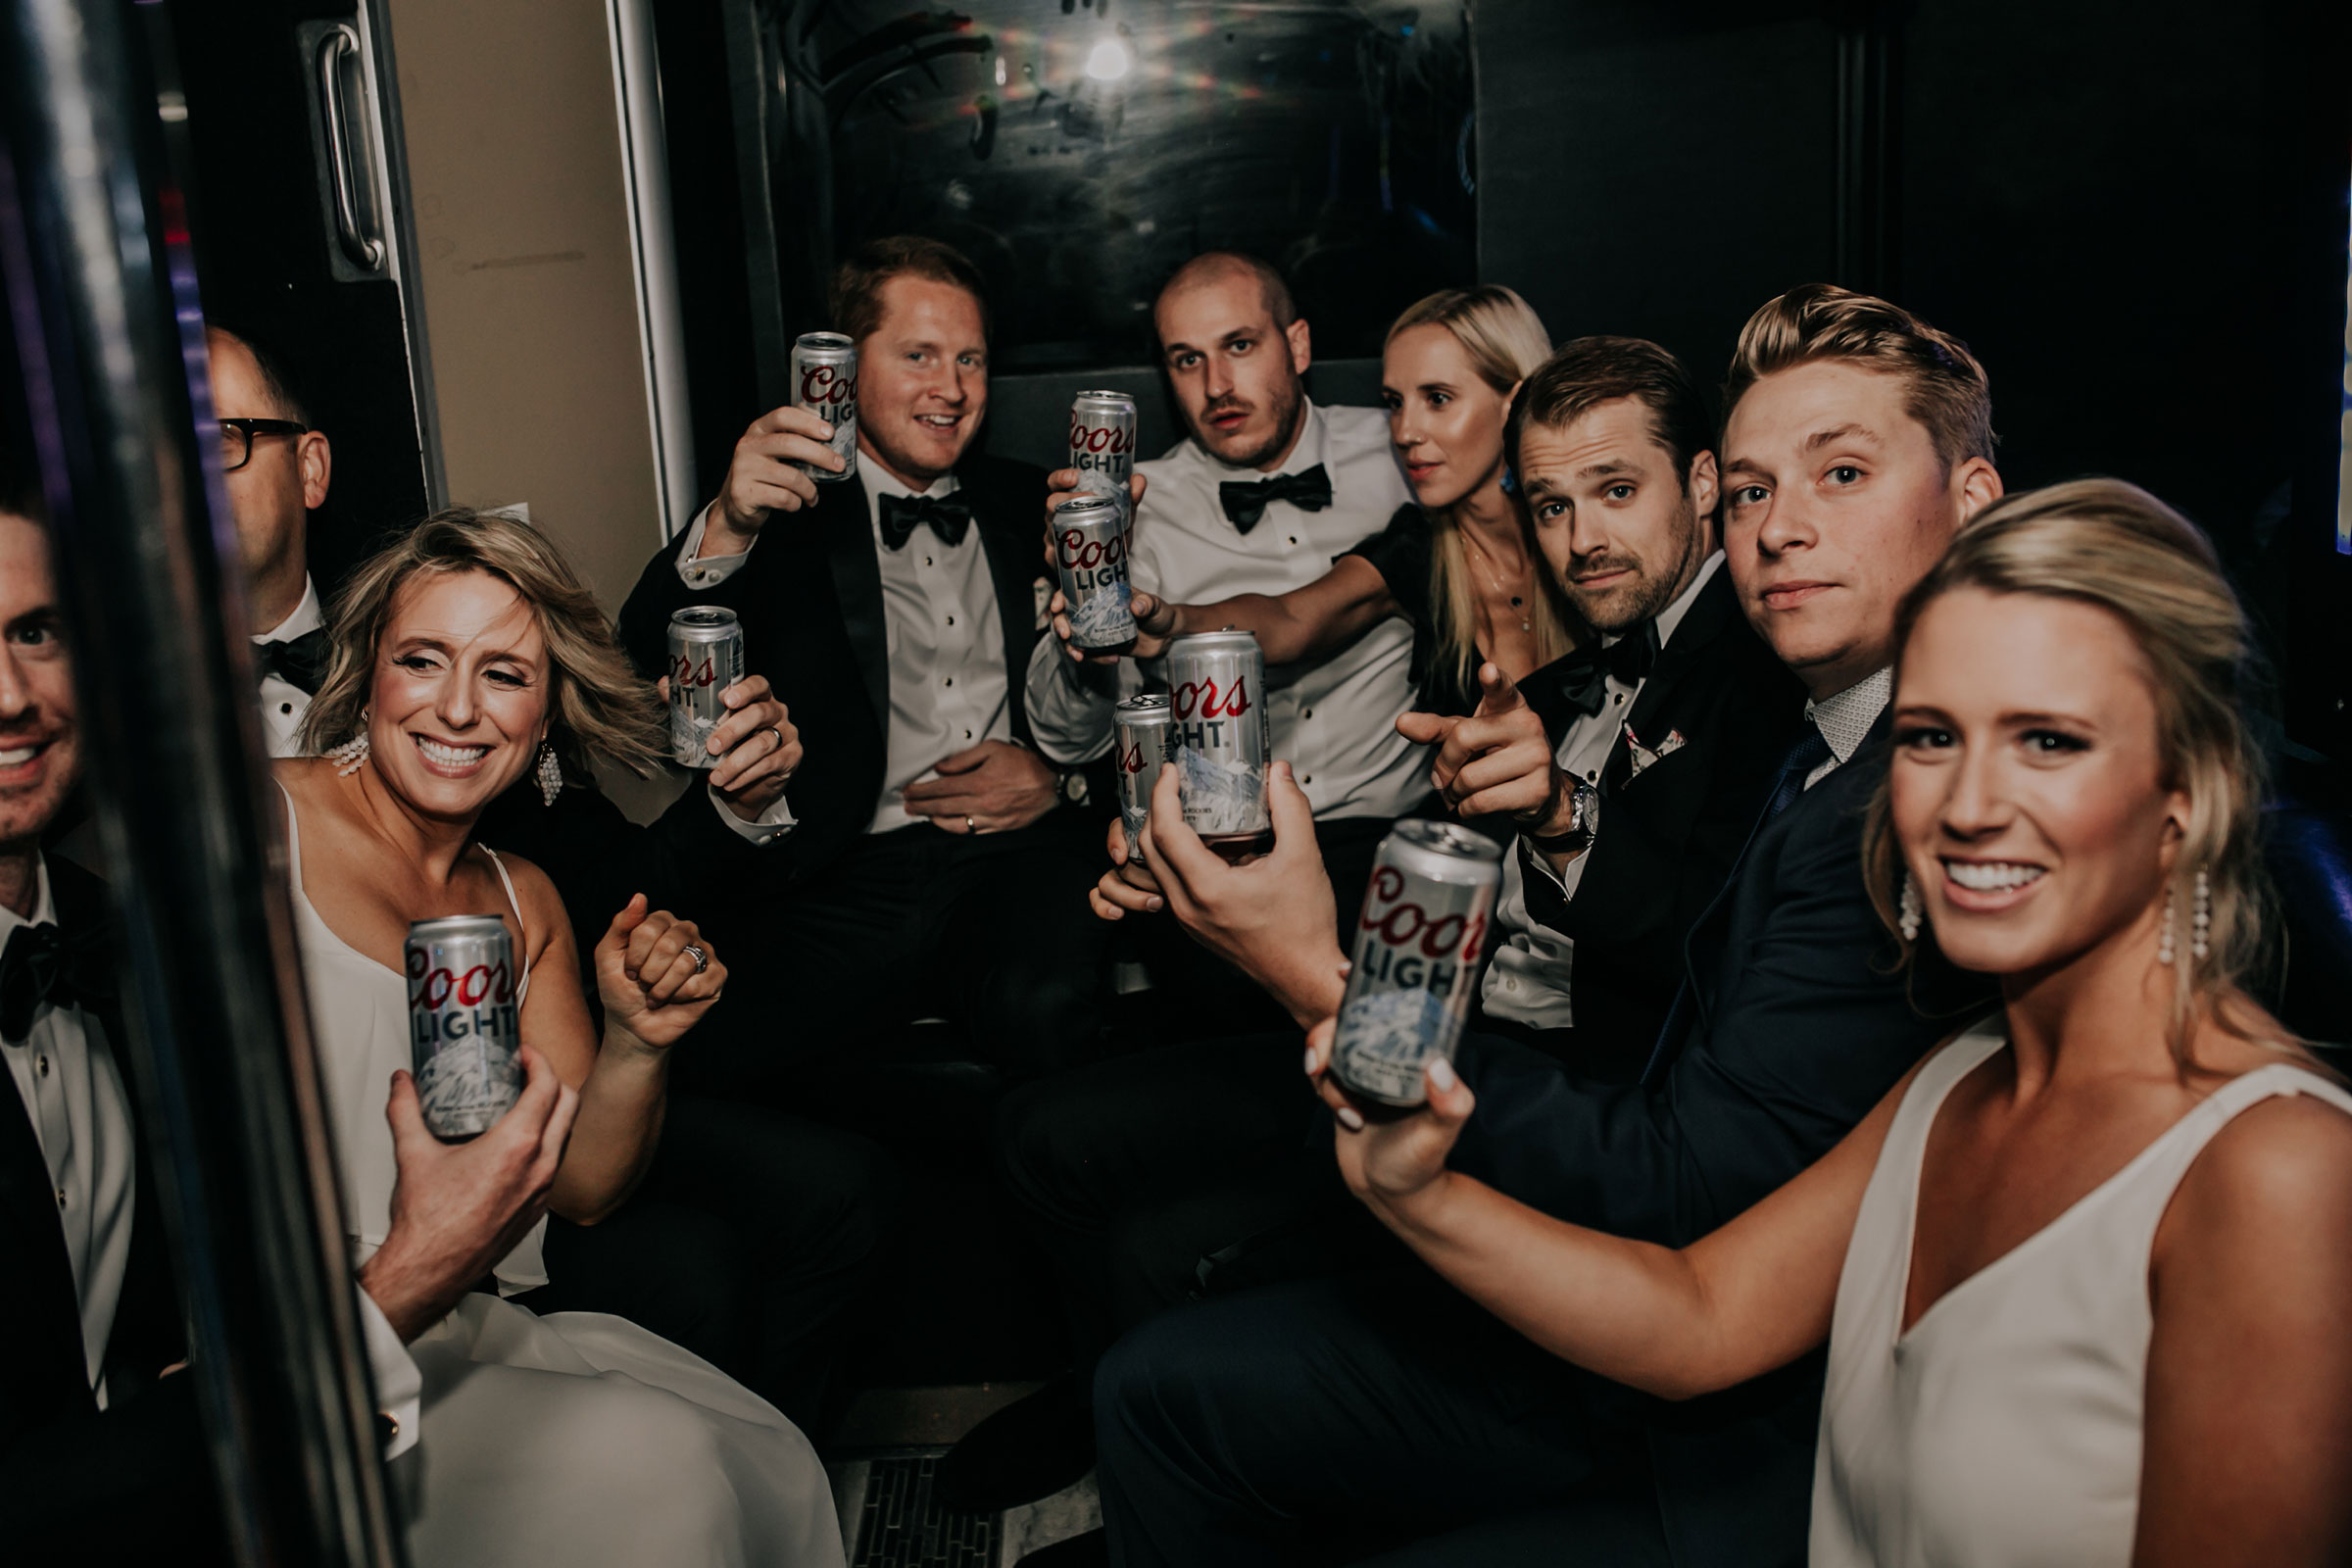 wedding-party-cheers-on-bus-omaha-nebraska-raelyn-ramey-photography.jpg